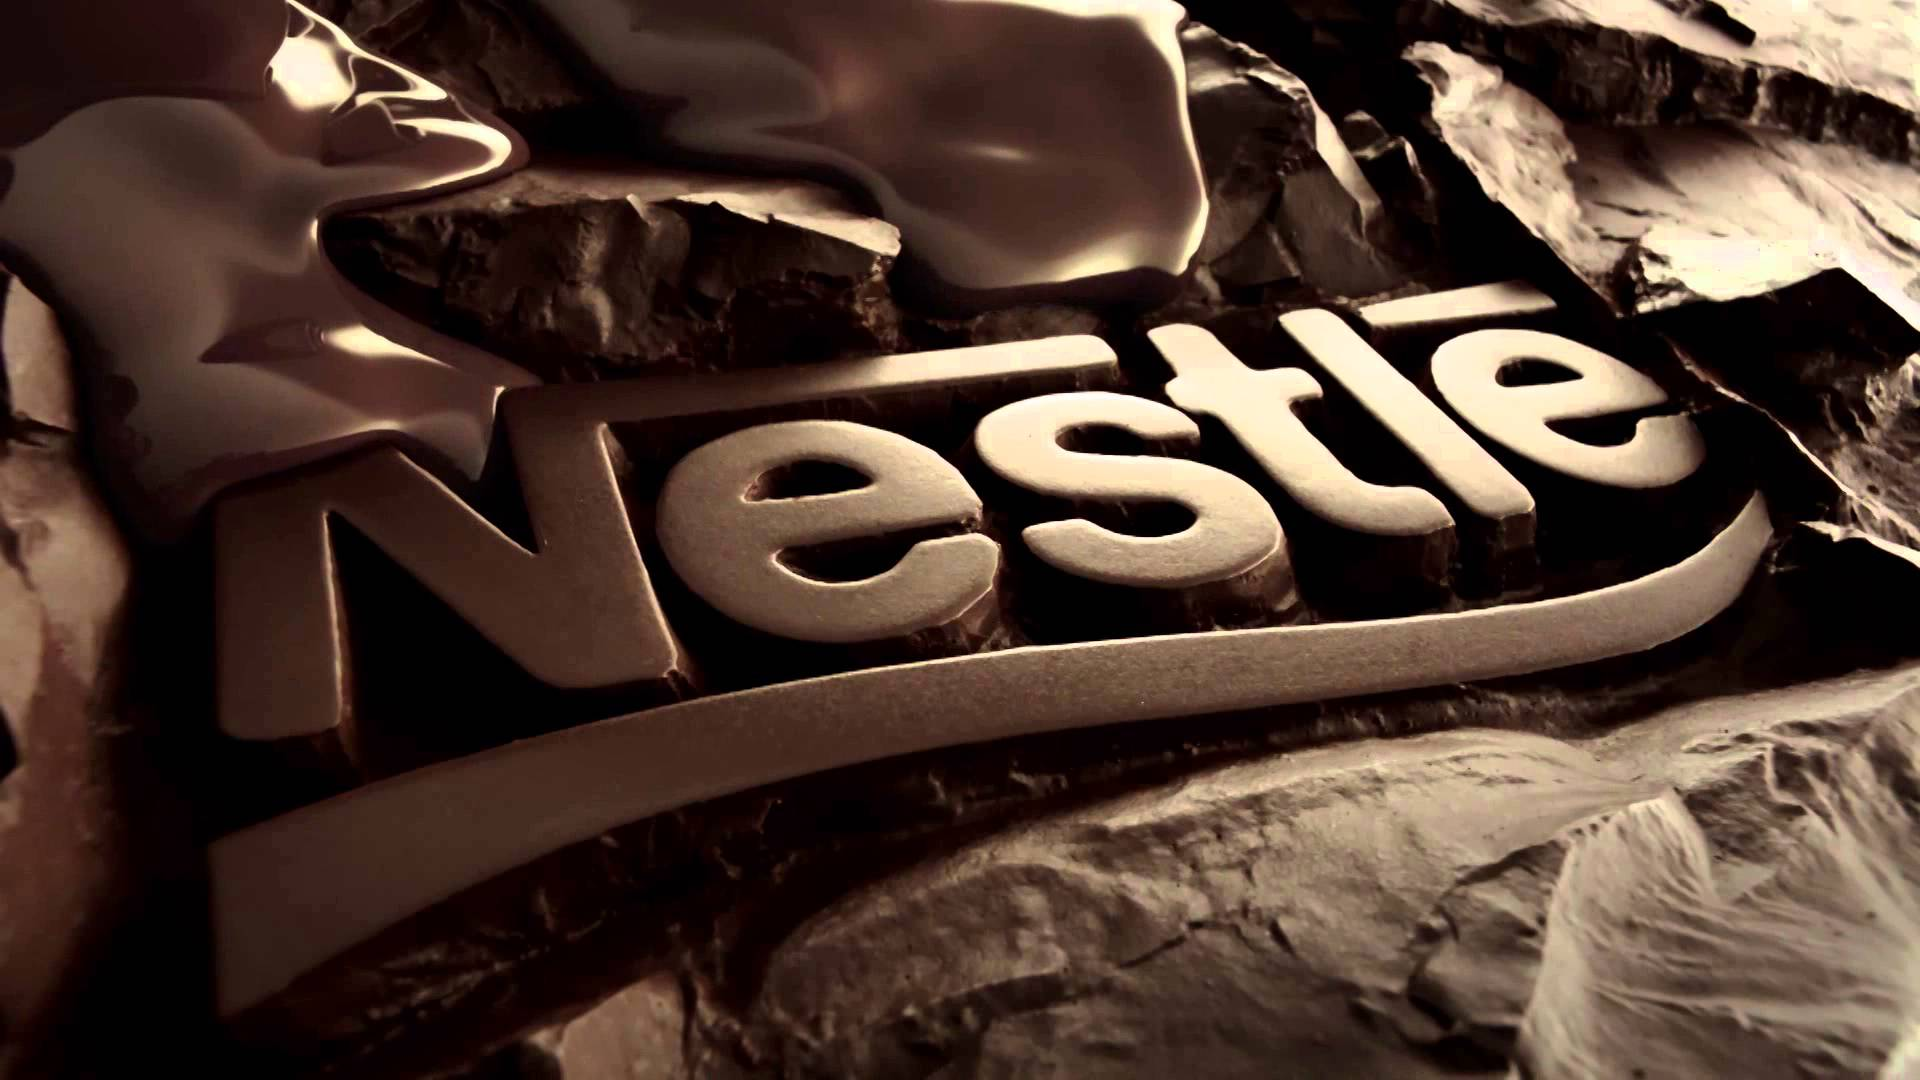 Nestle HD Wallpapers 1920x1080